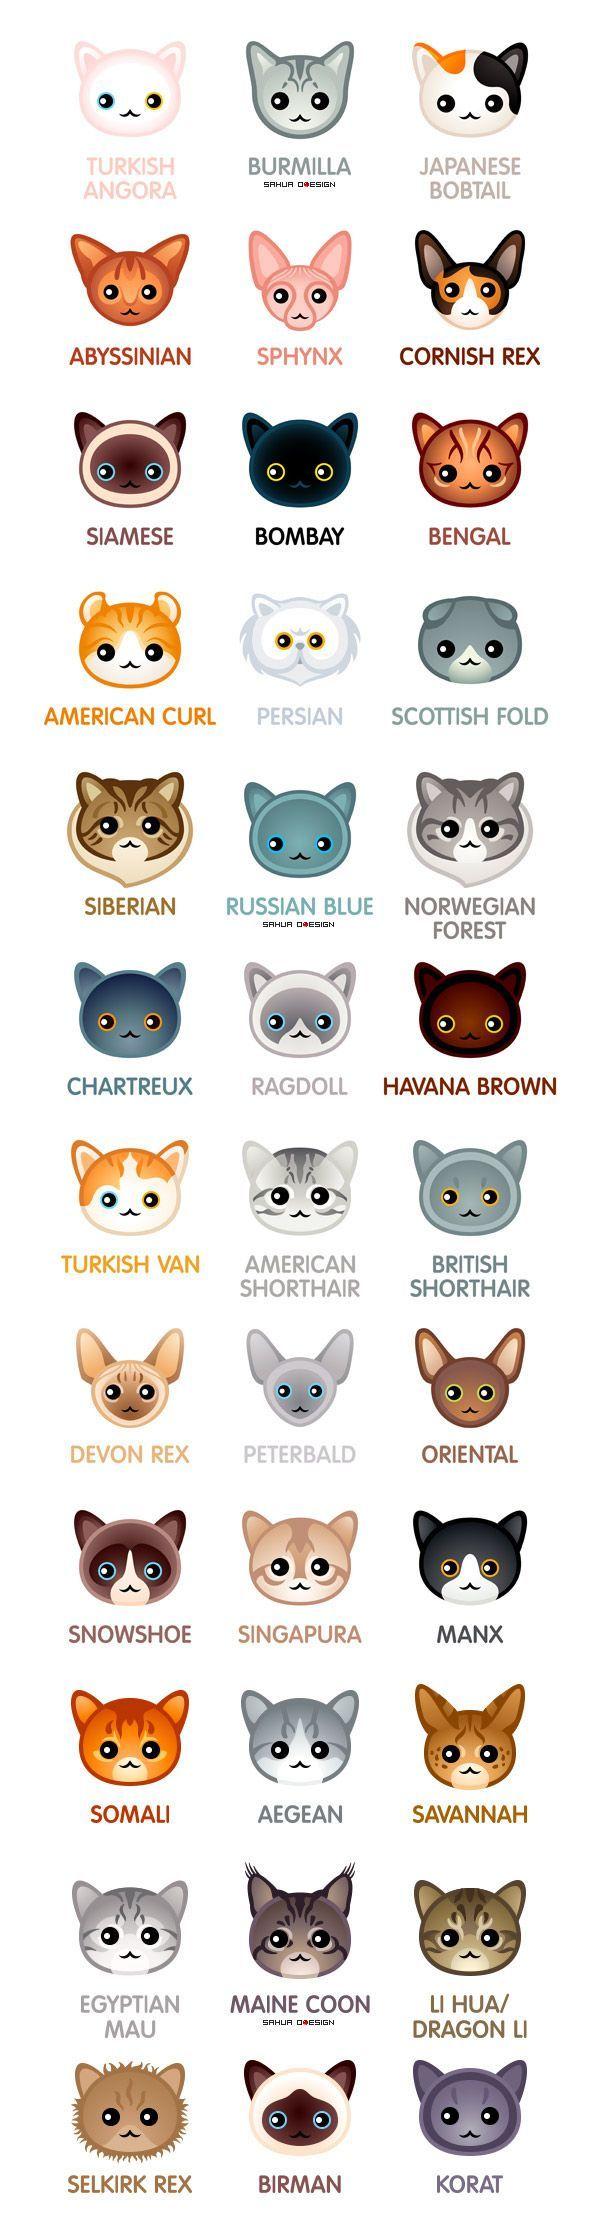 Kawaii cats by sahua d http://amzn.to/2rXdlv5